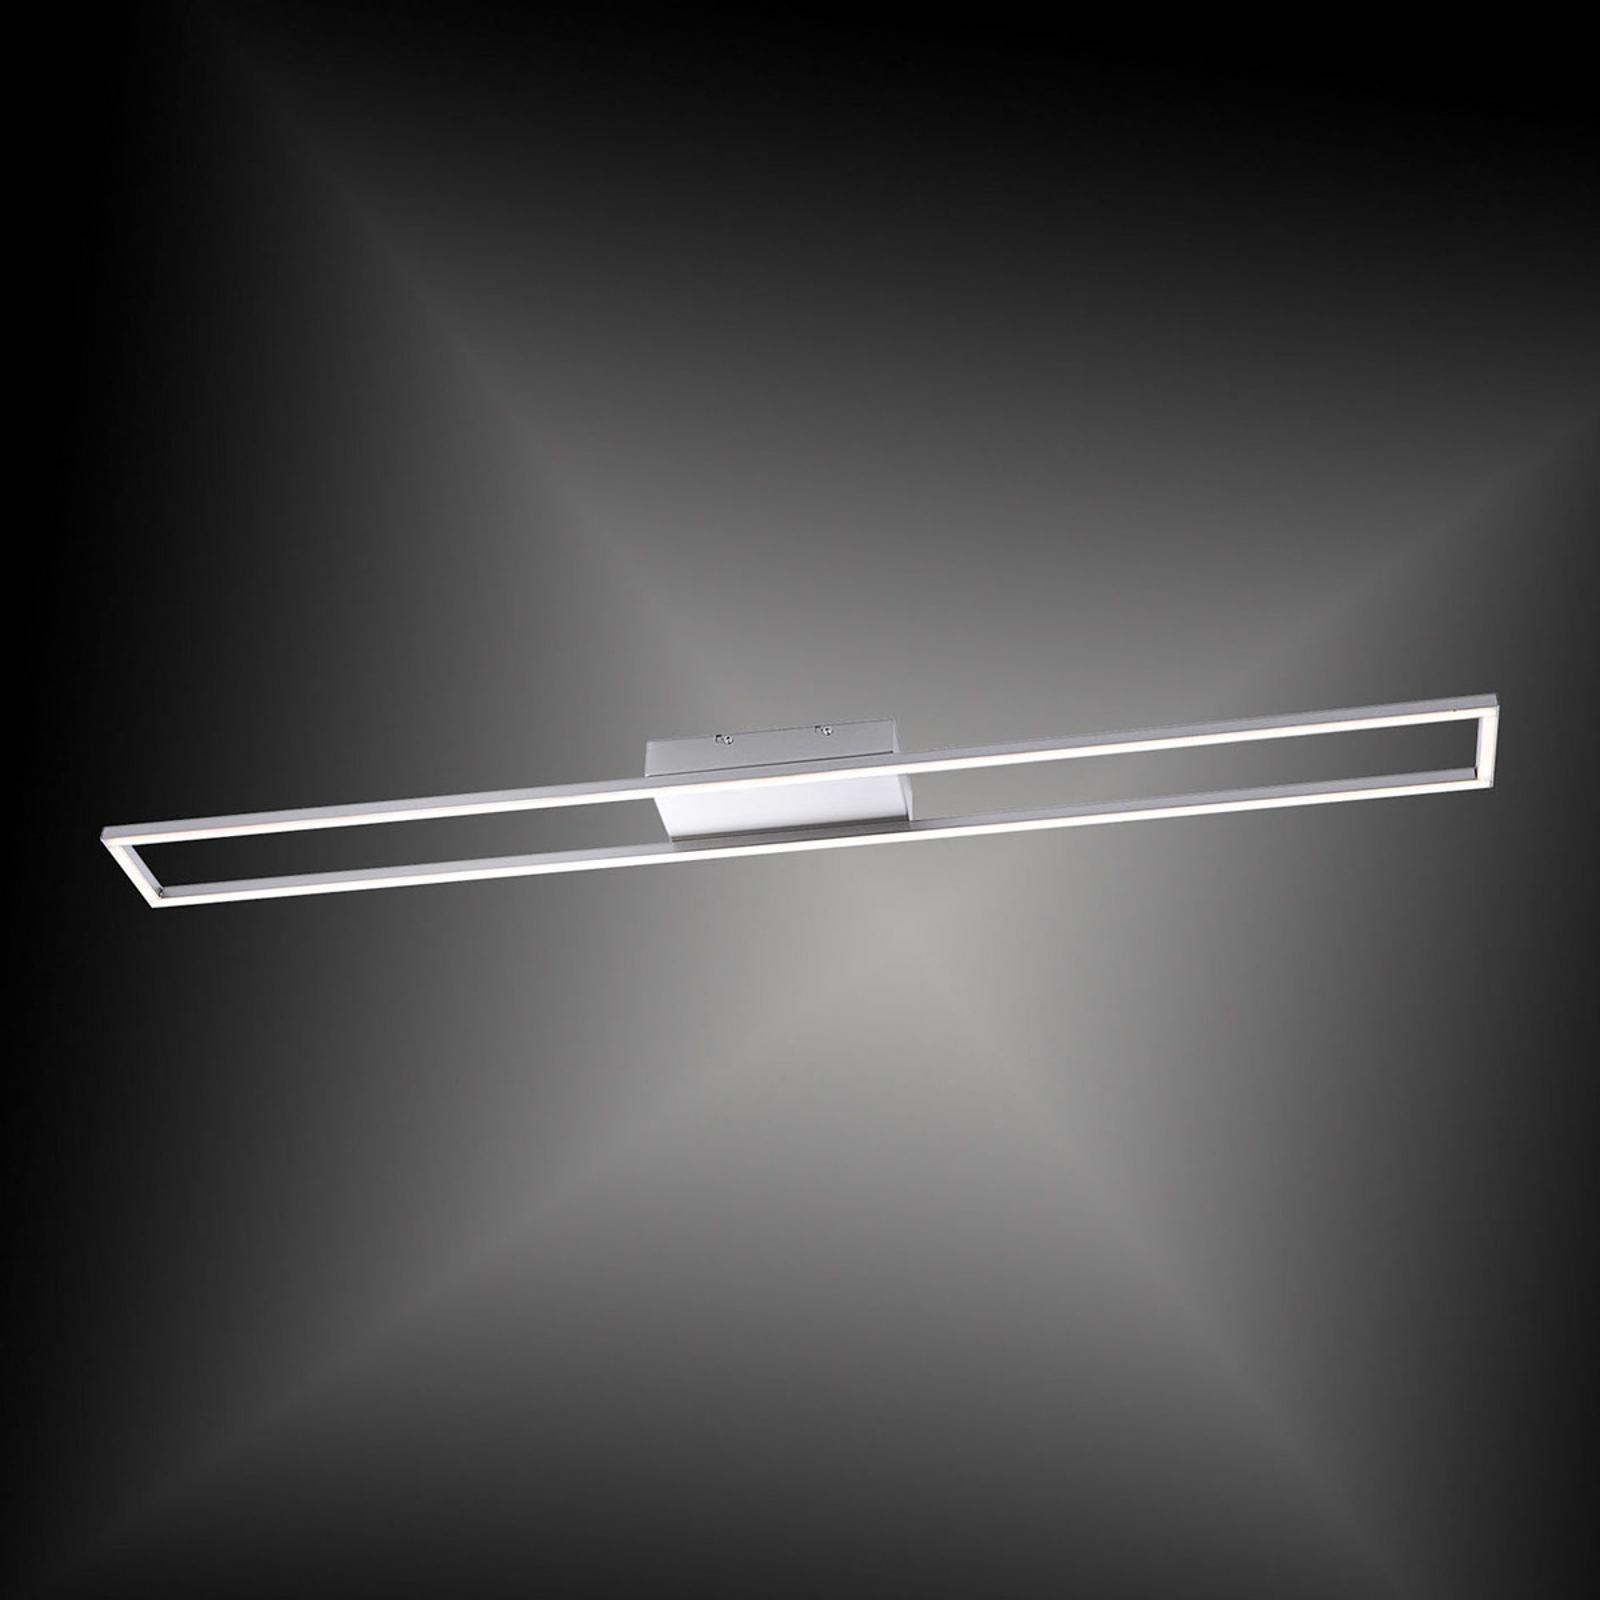 LED-taklampe Inigo, 110 cm